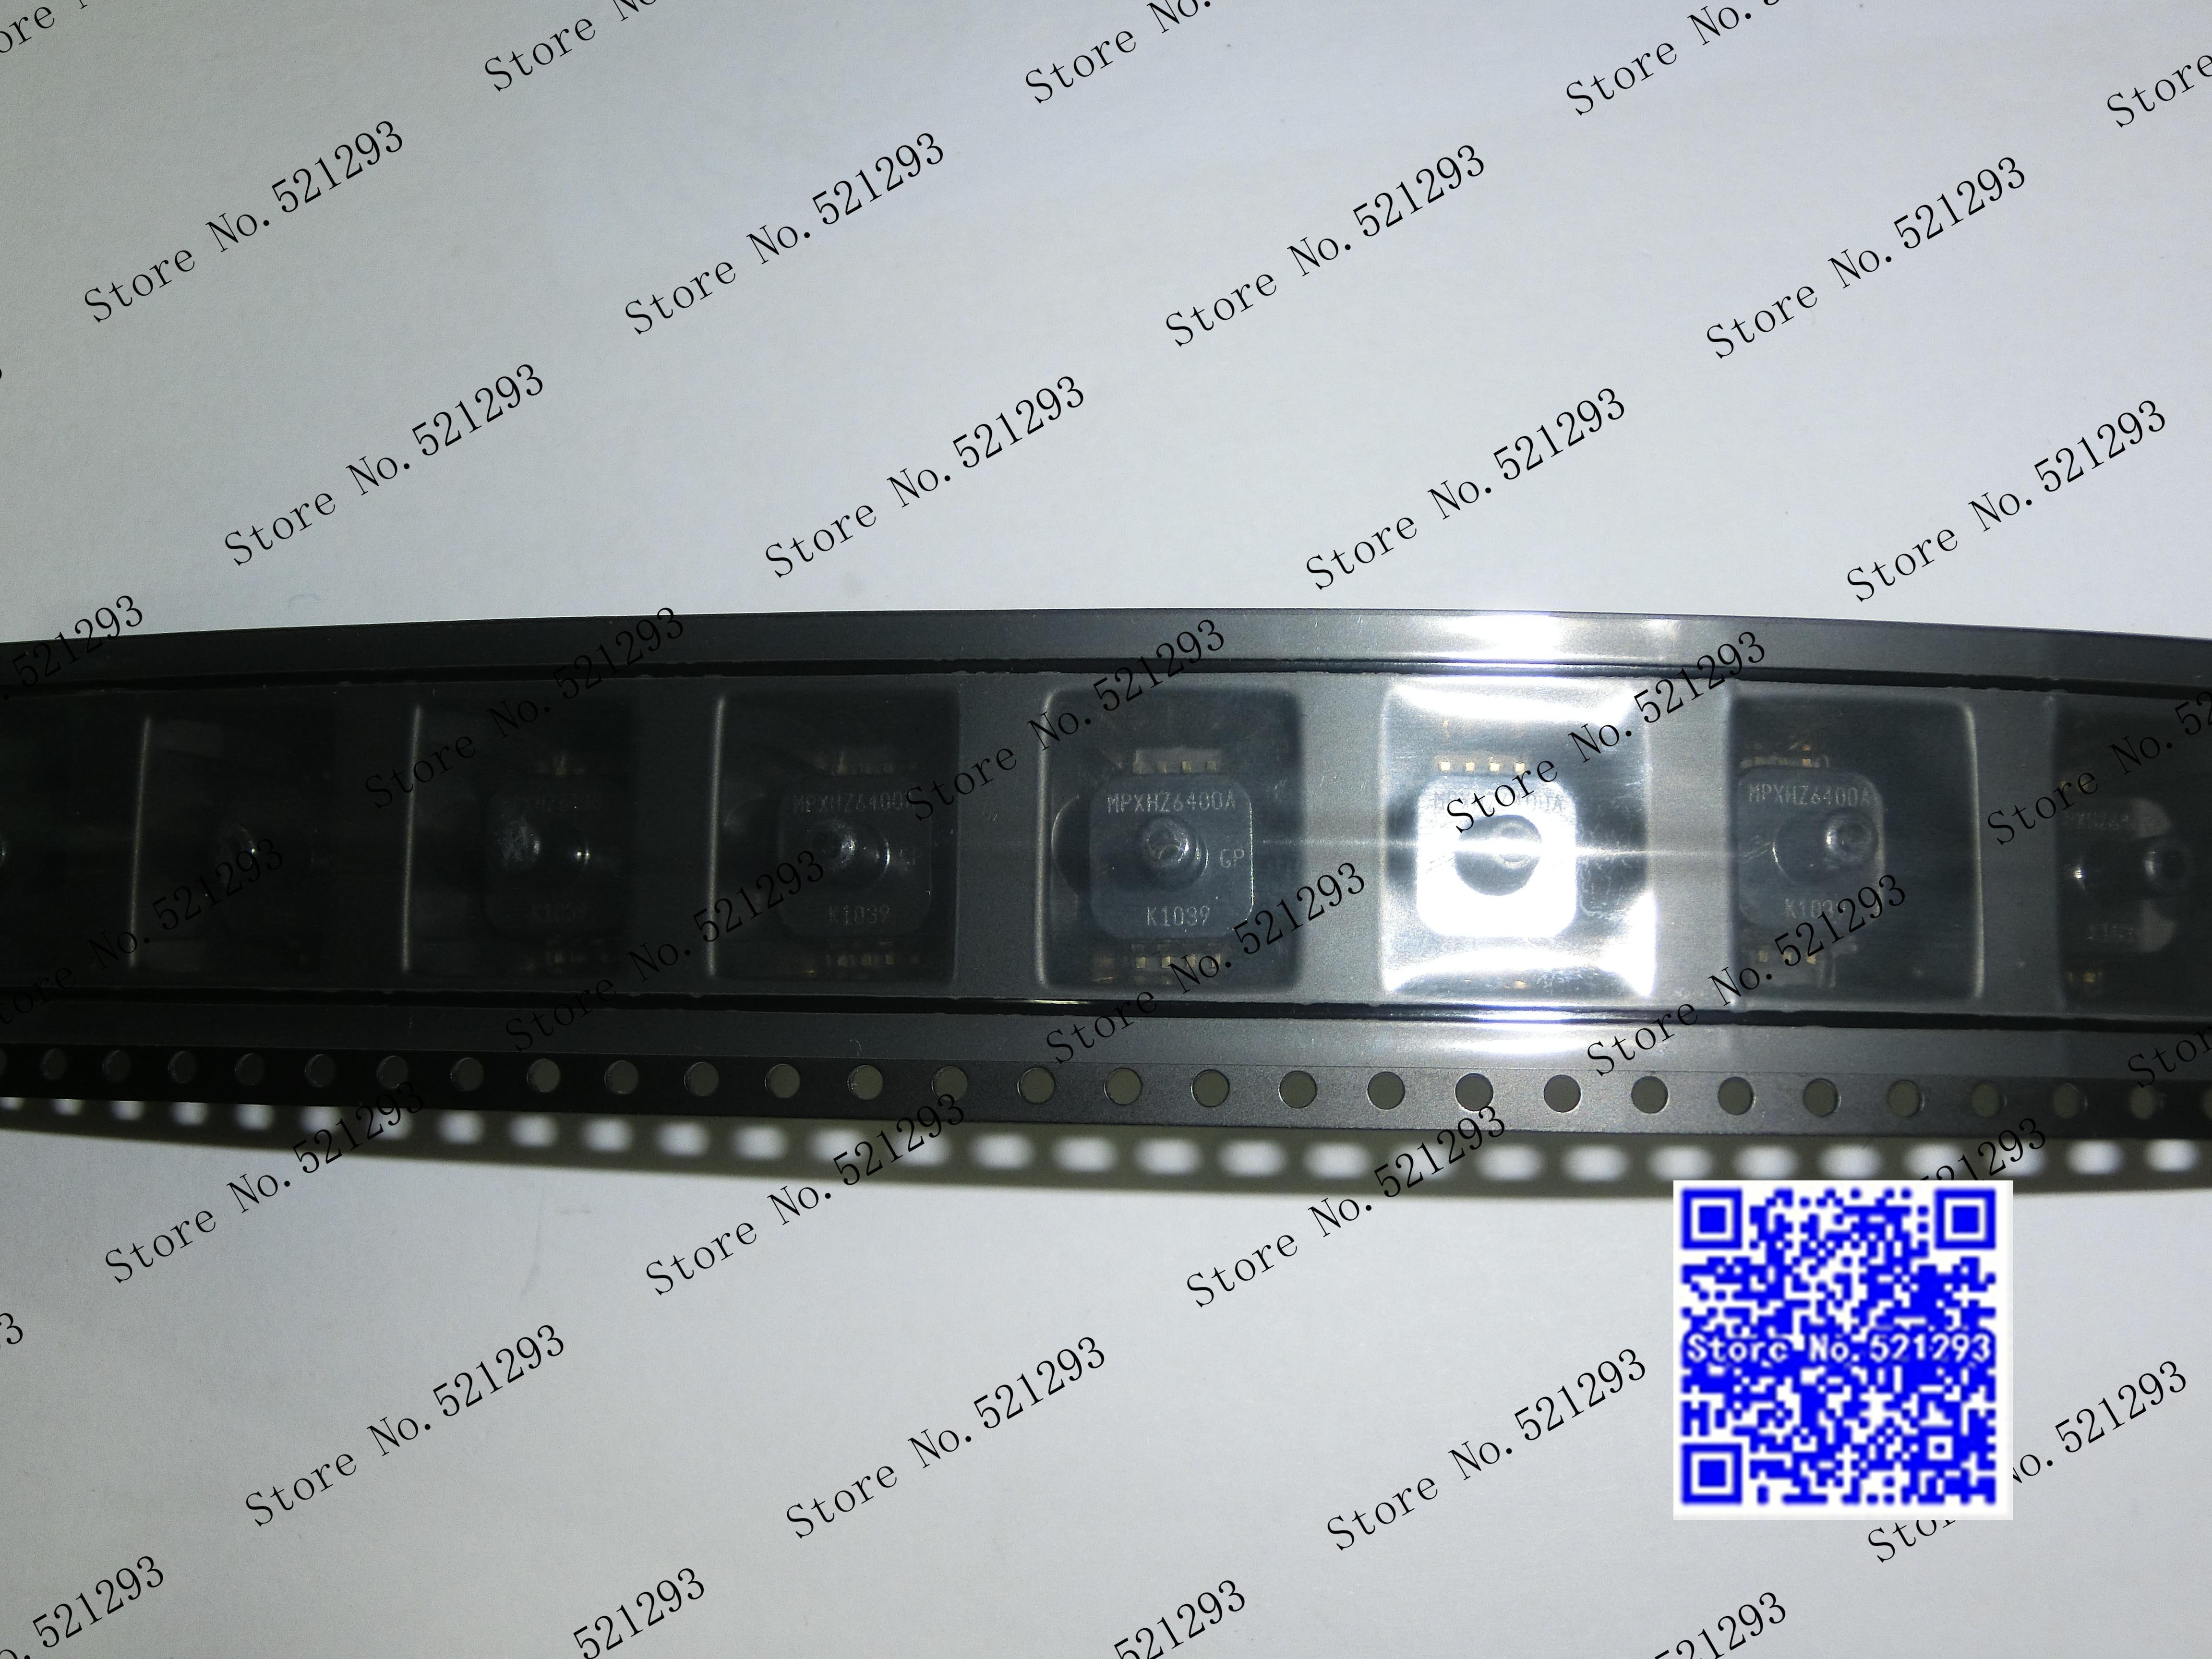 Free Shipping Mpxh6400ac6t Mpxh6400ac6 Mpxh6400ac Mpxh6400 6400 Images La4550 Audio Amplifier Circuit Smd 5pcs